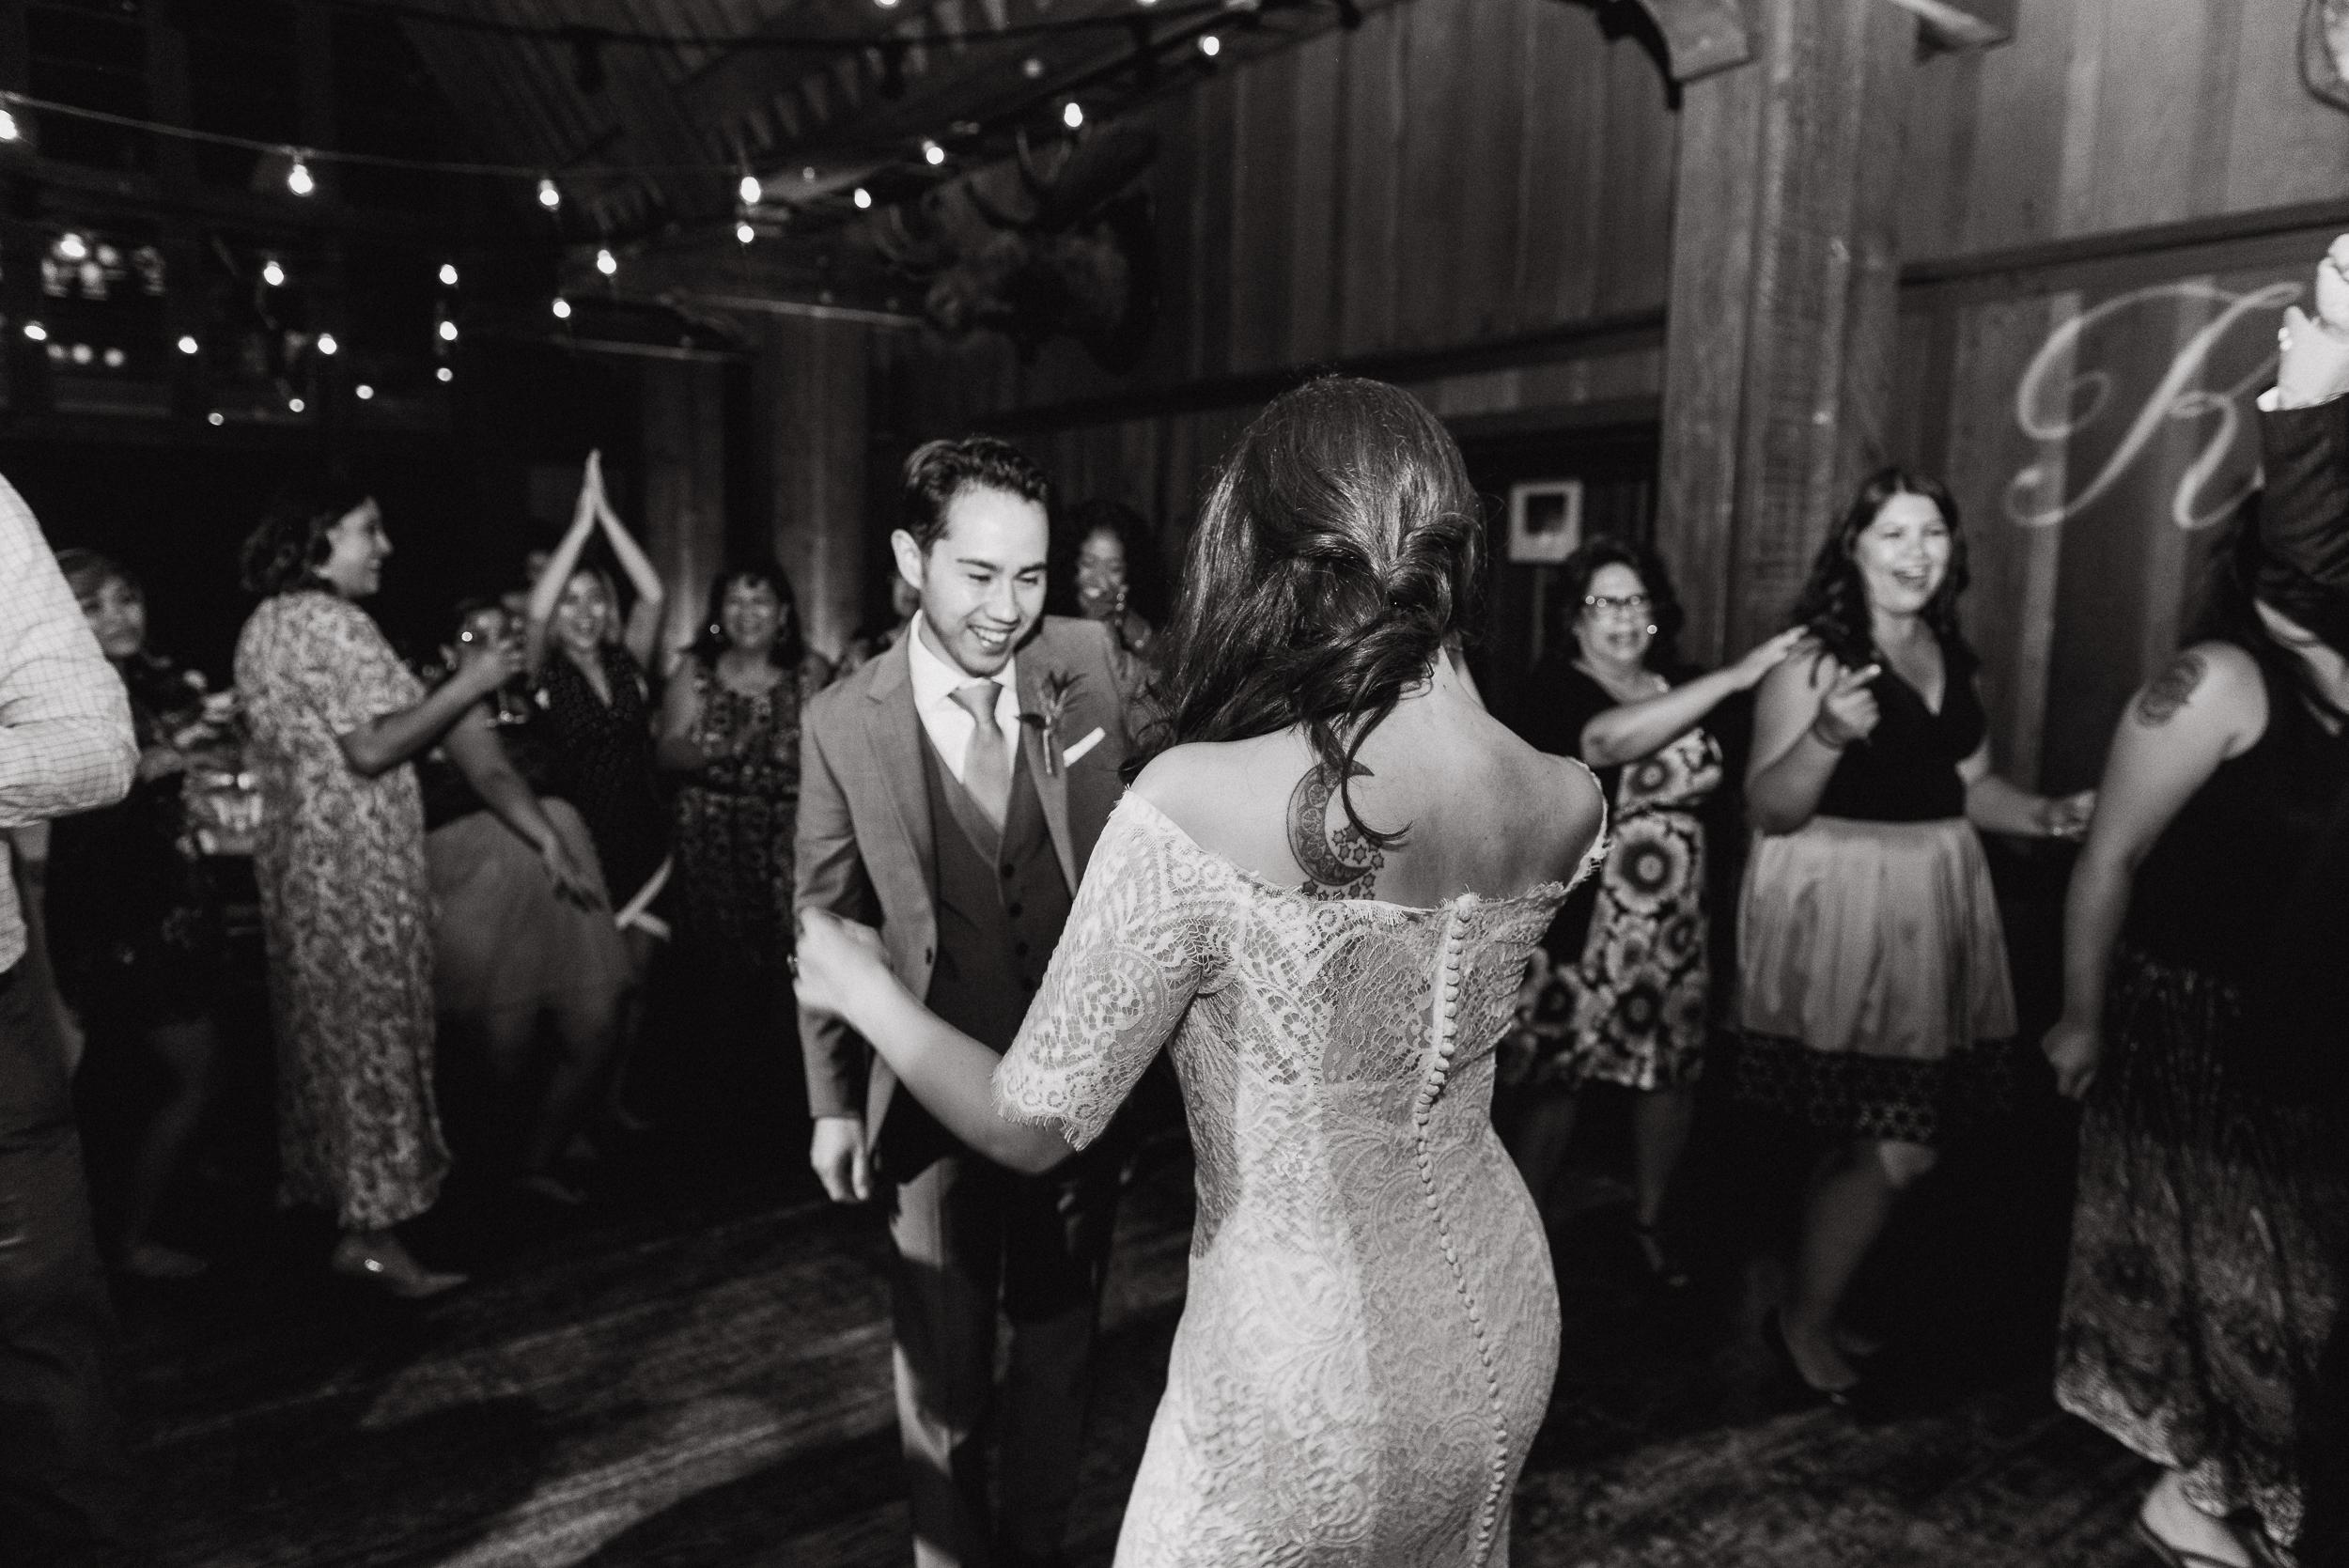 84-berkeley-uc-faculty-club-wedding-kb-vivianchen-507.jpg